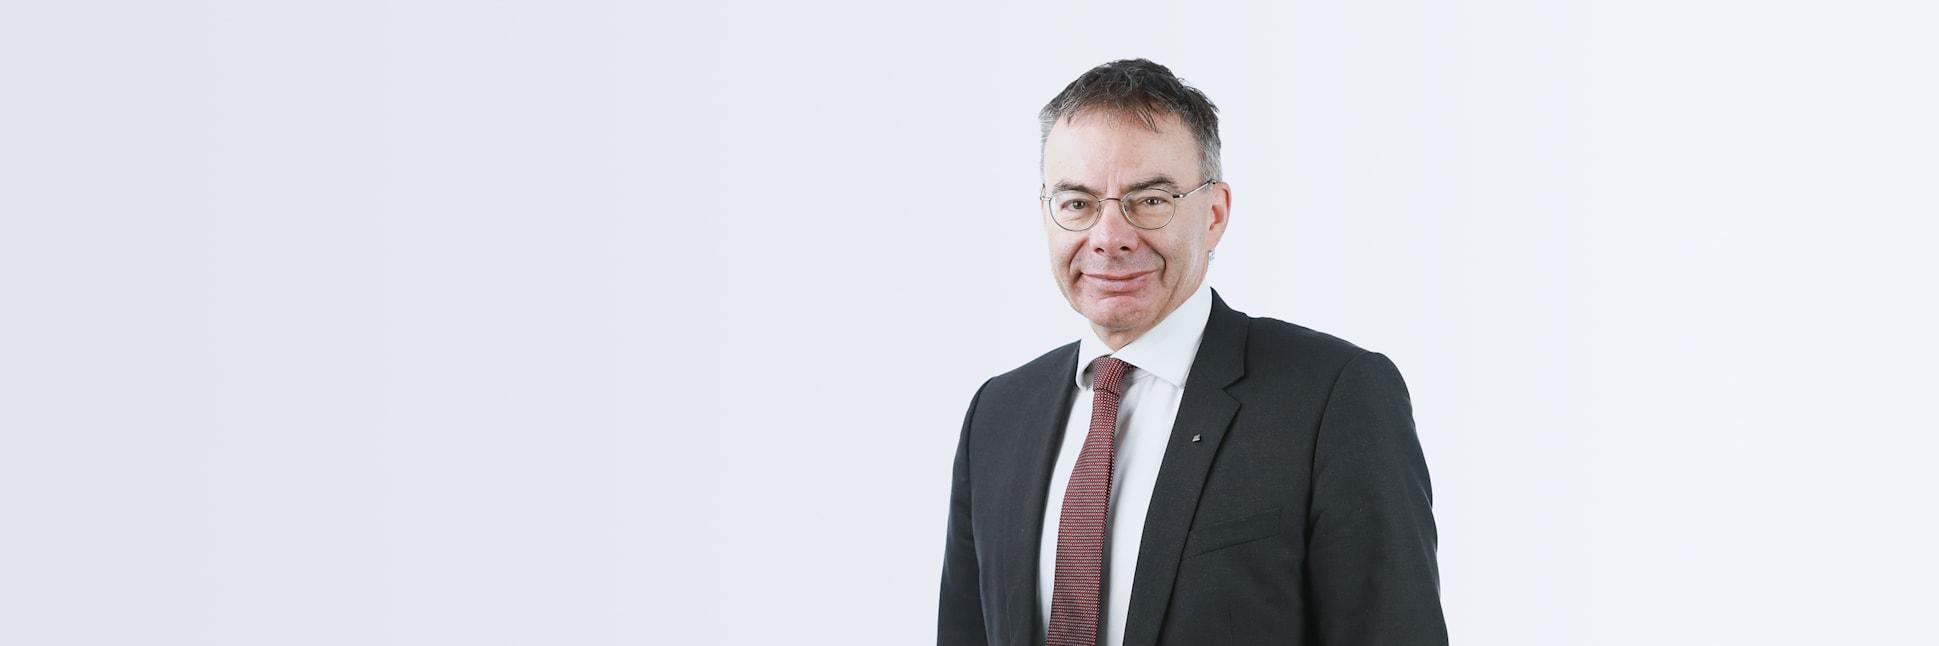 Thomas Bieger Jungfraubahnen